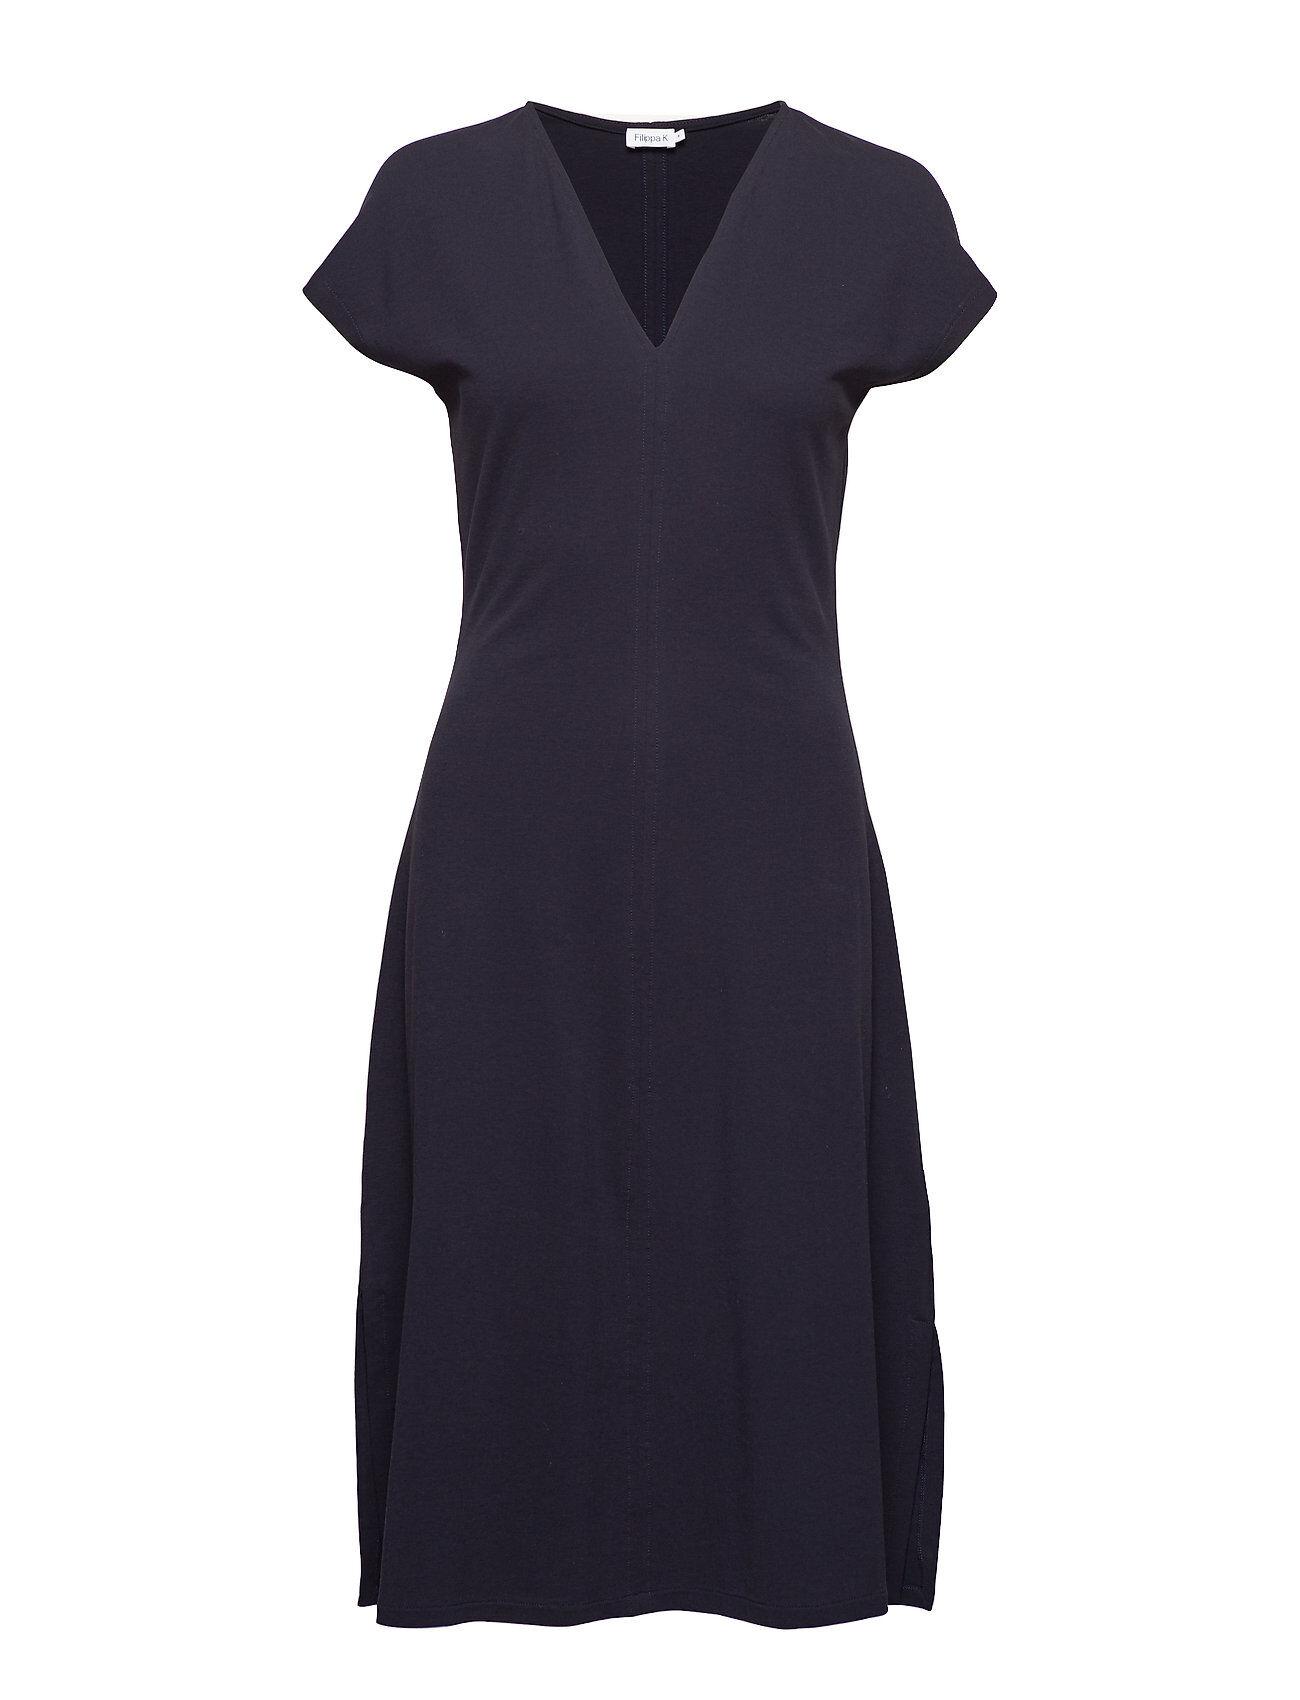 Filippa K Clean-Cut Cap Sleeve Dress